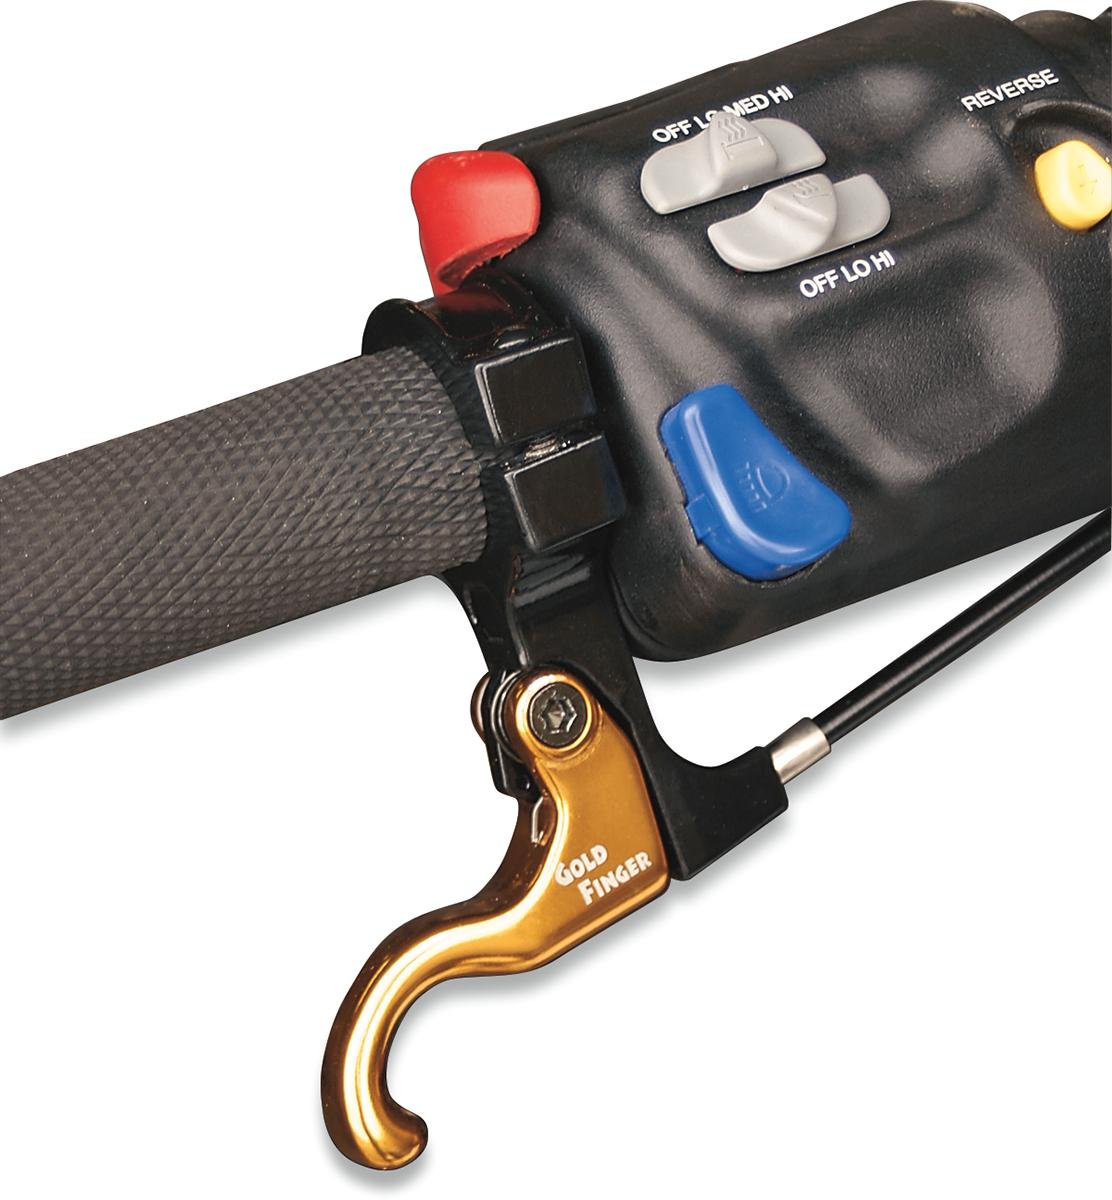 2001-2002 Polaris XCR 800 Parts Unlimited Throttle Cable